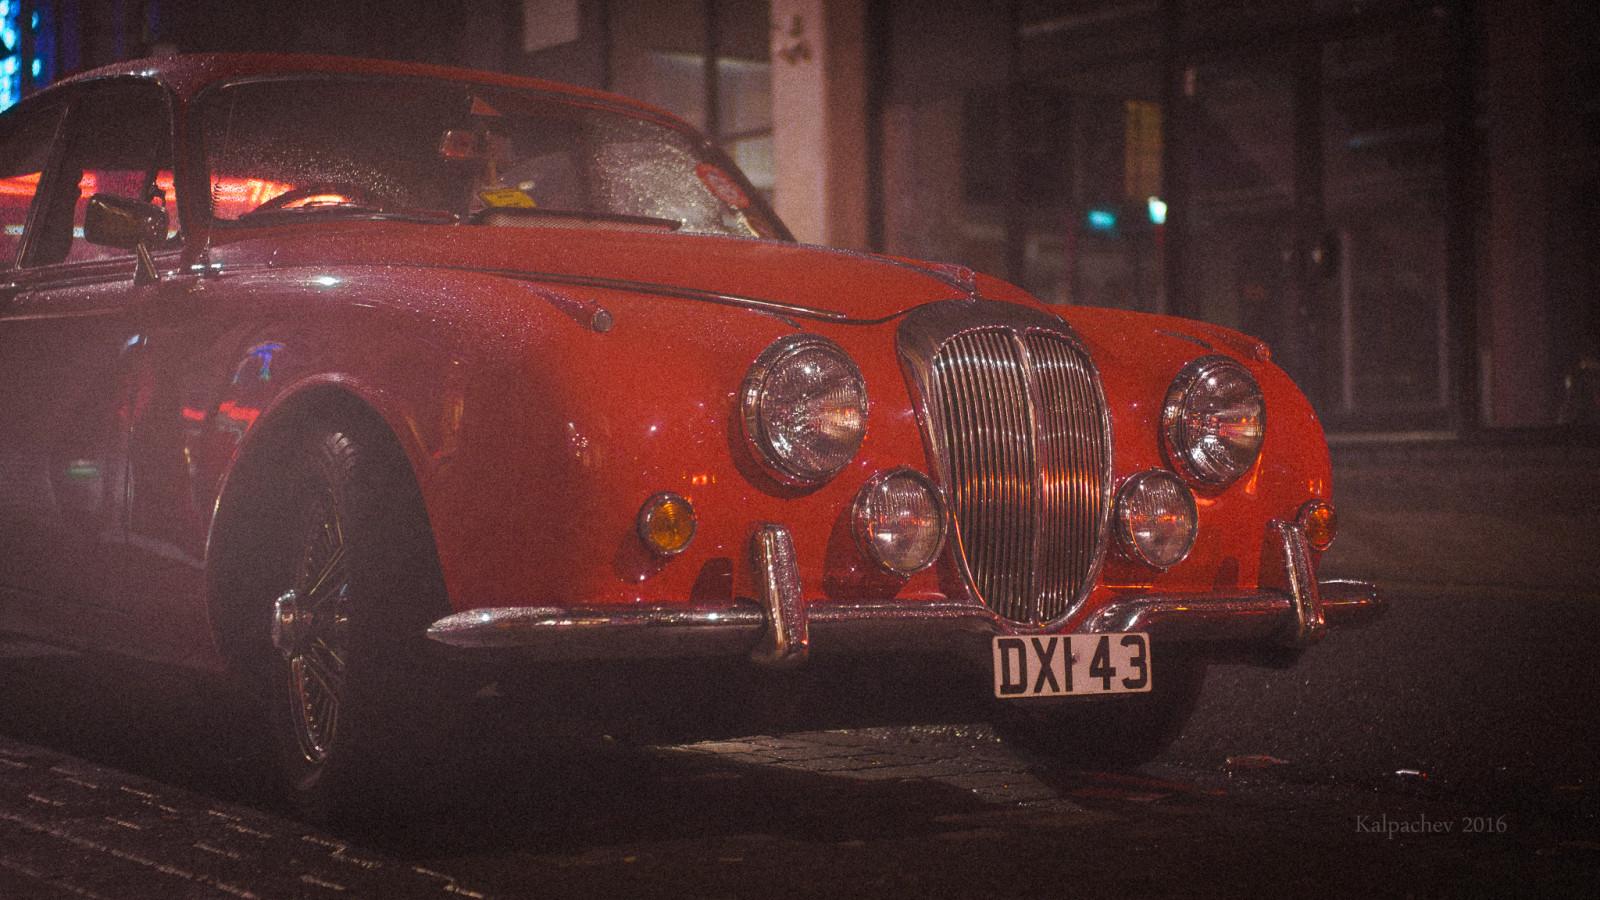 Red car London